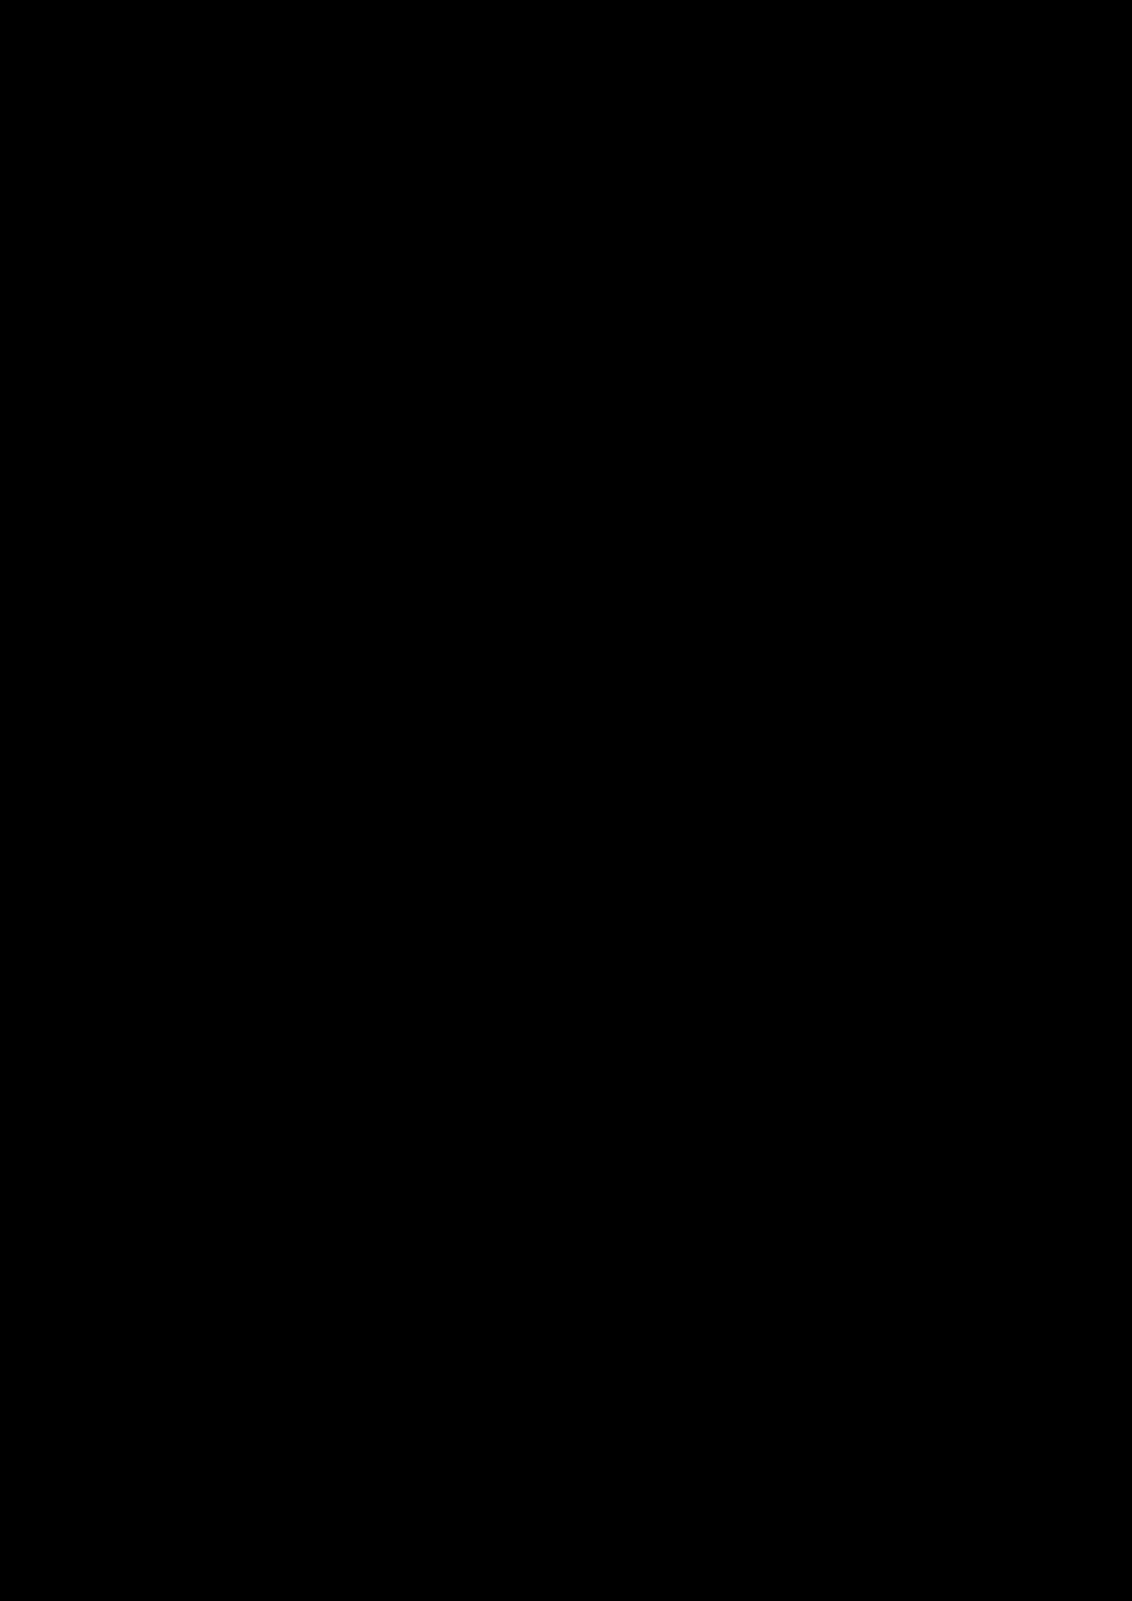 Belyiy sokol slide, Image 193